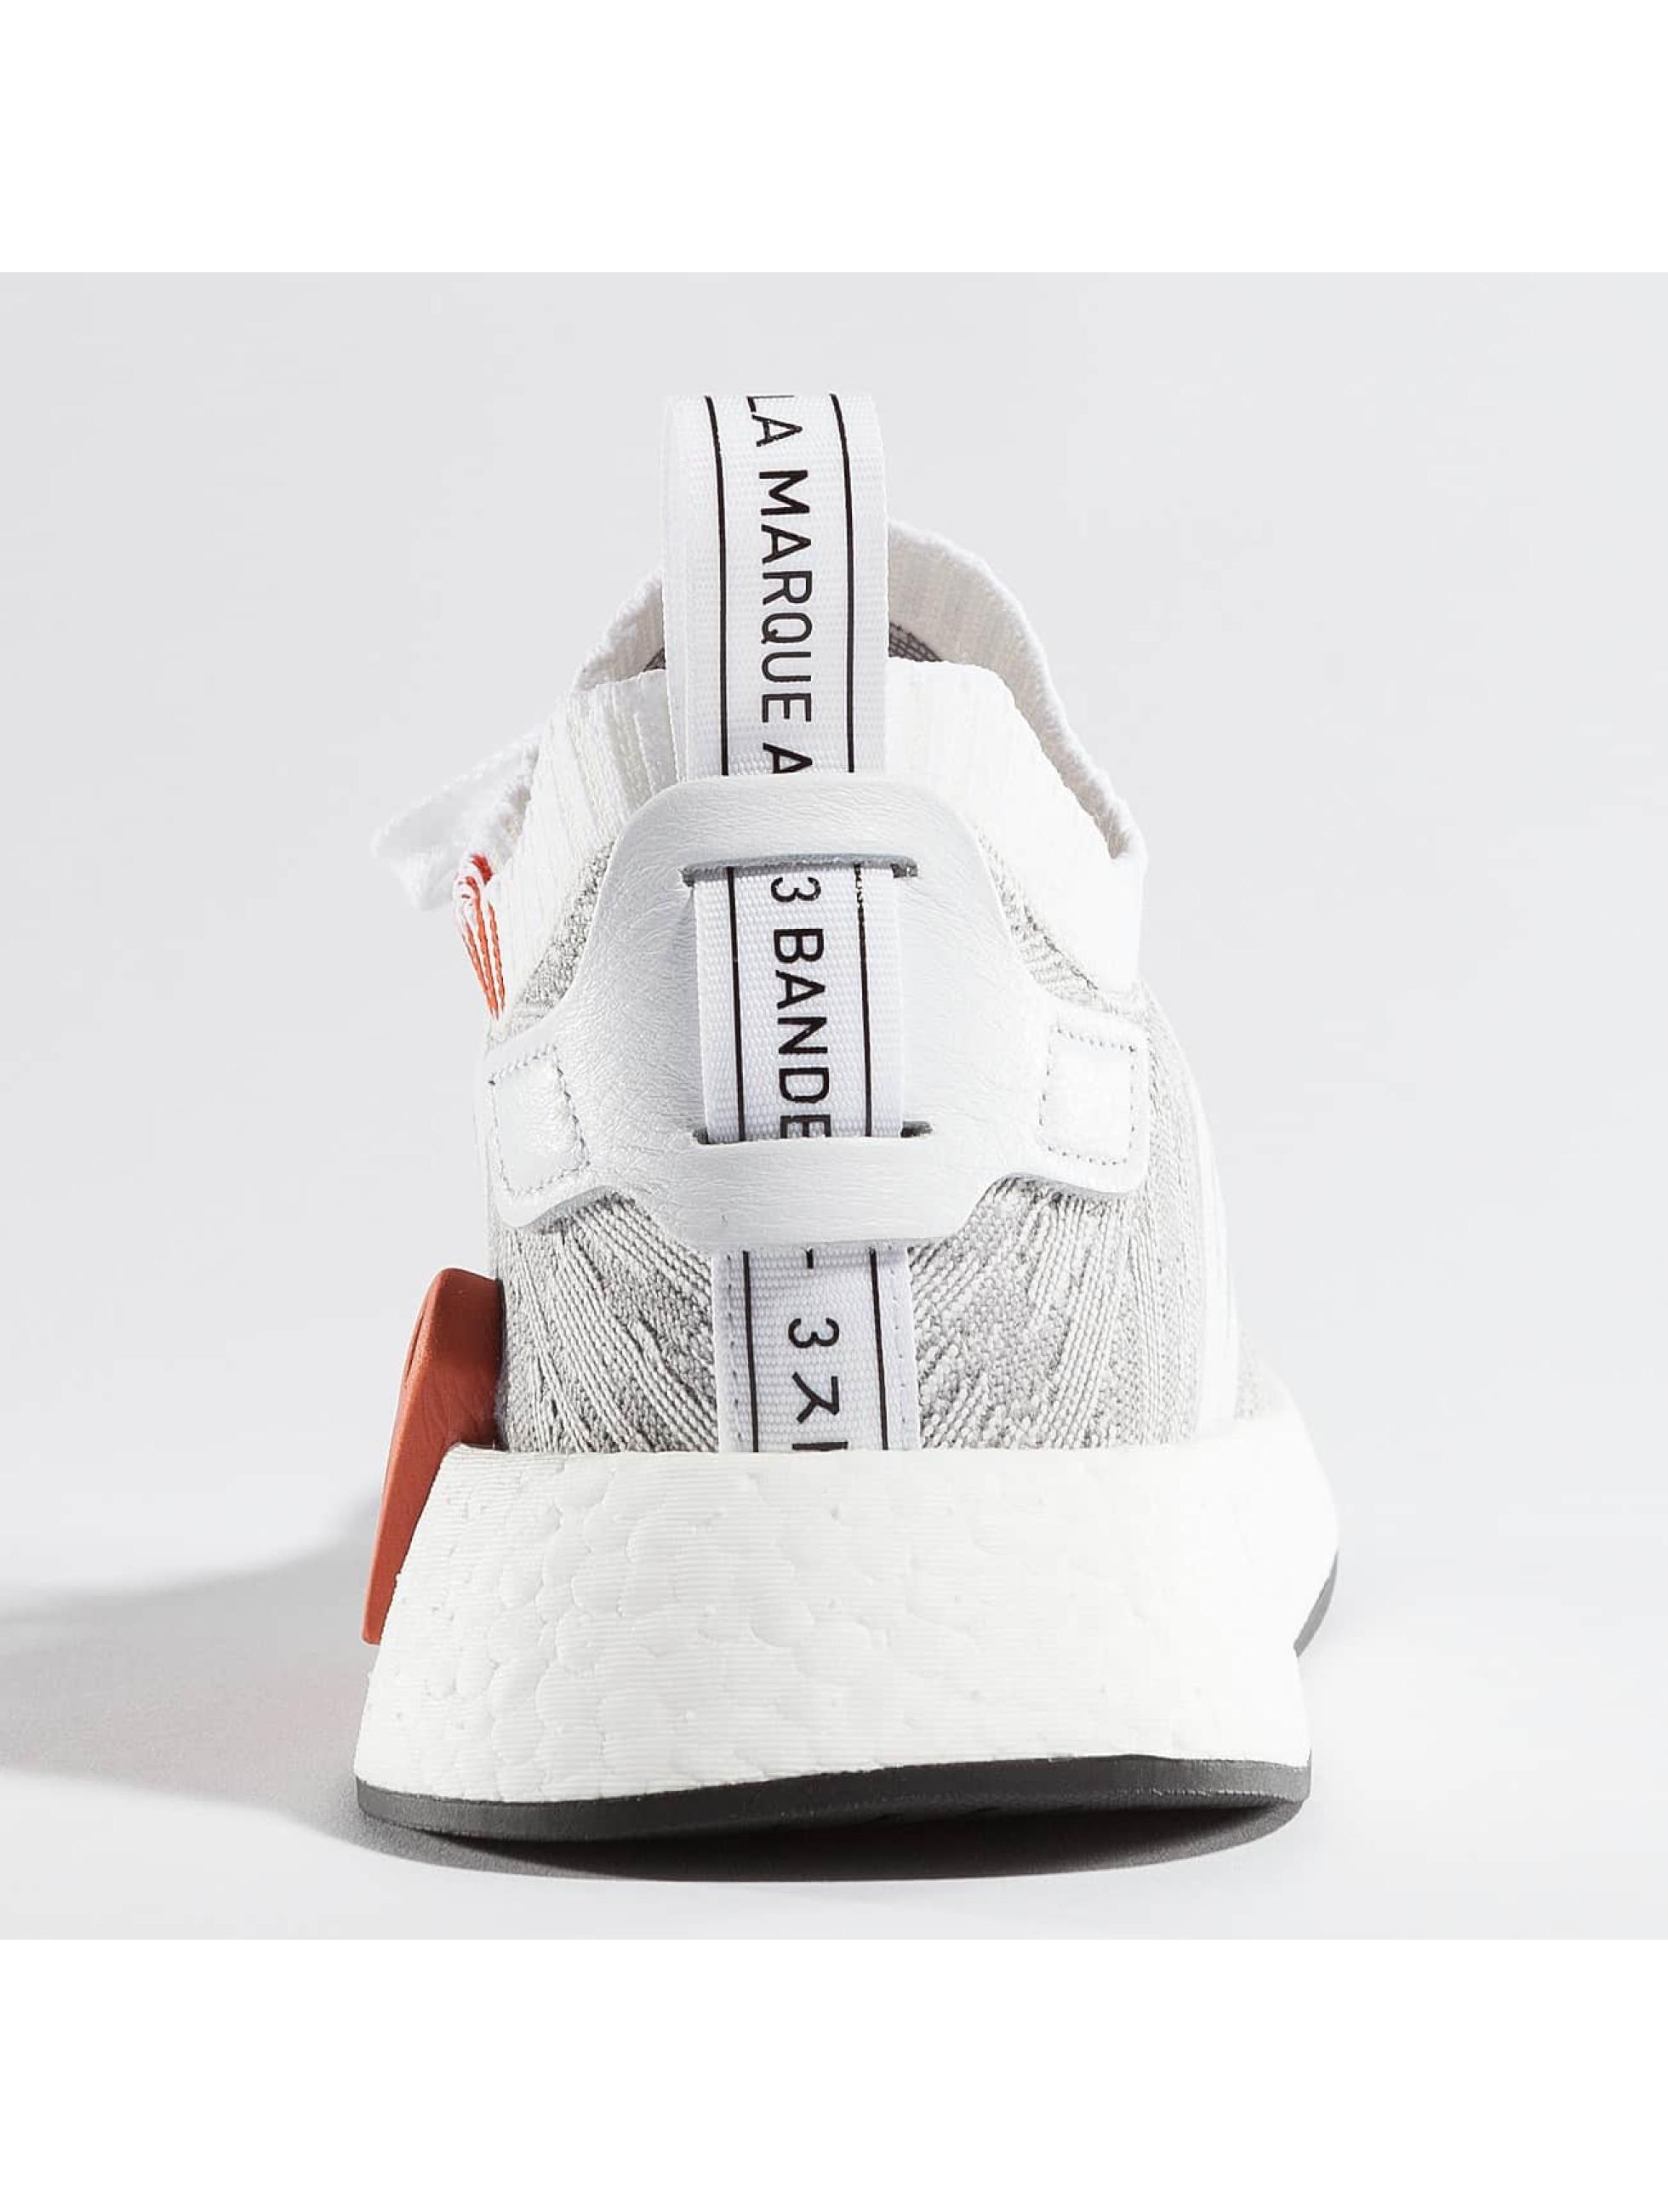 adidas originals Sneakers NMD_R2 PK white